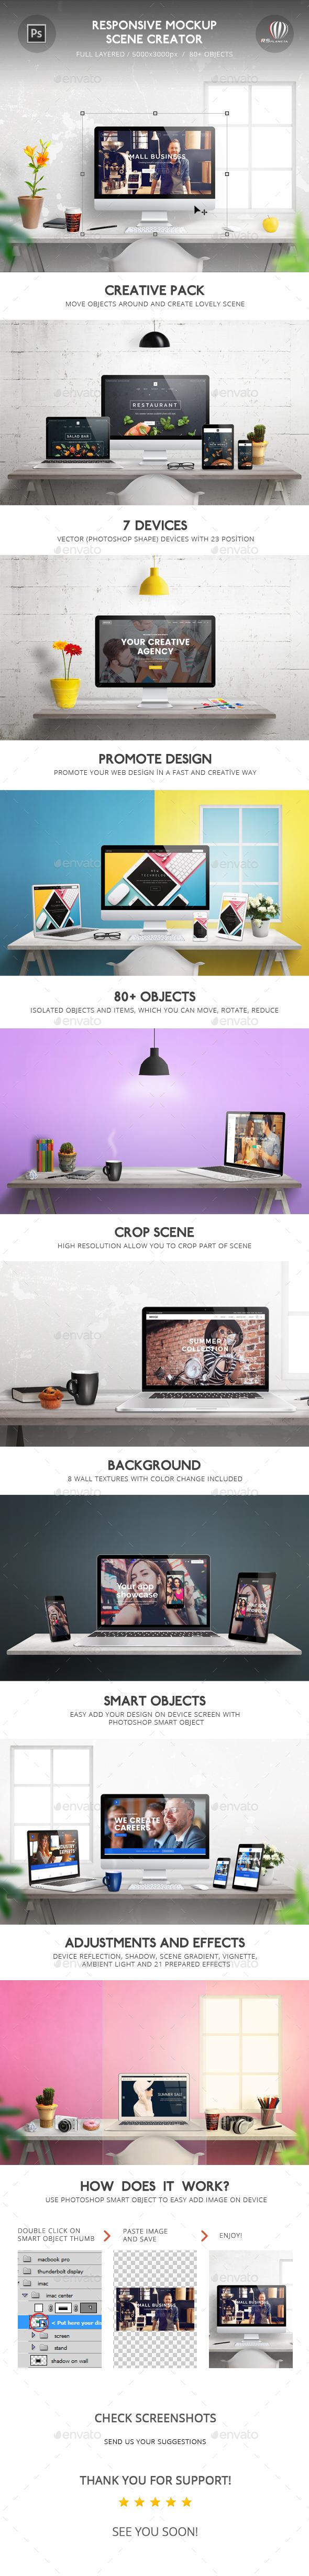 Responsive Mockup Scene Creator (Displays)